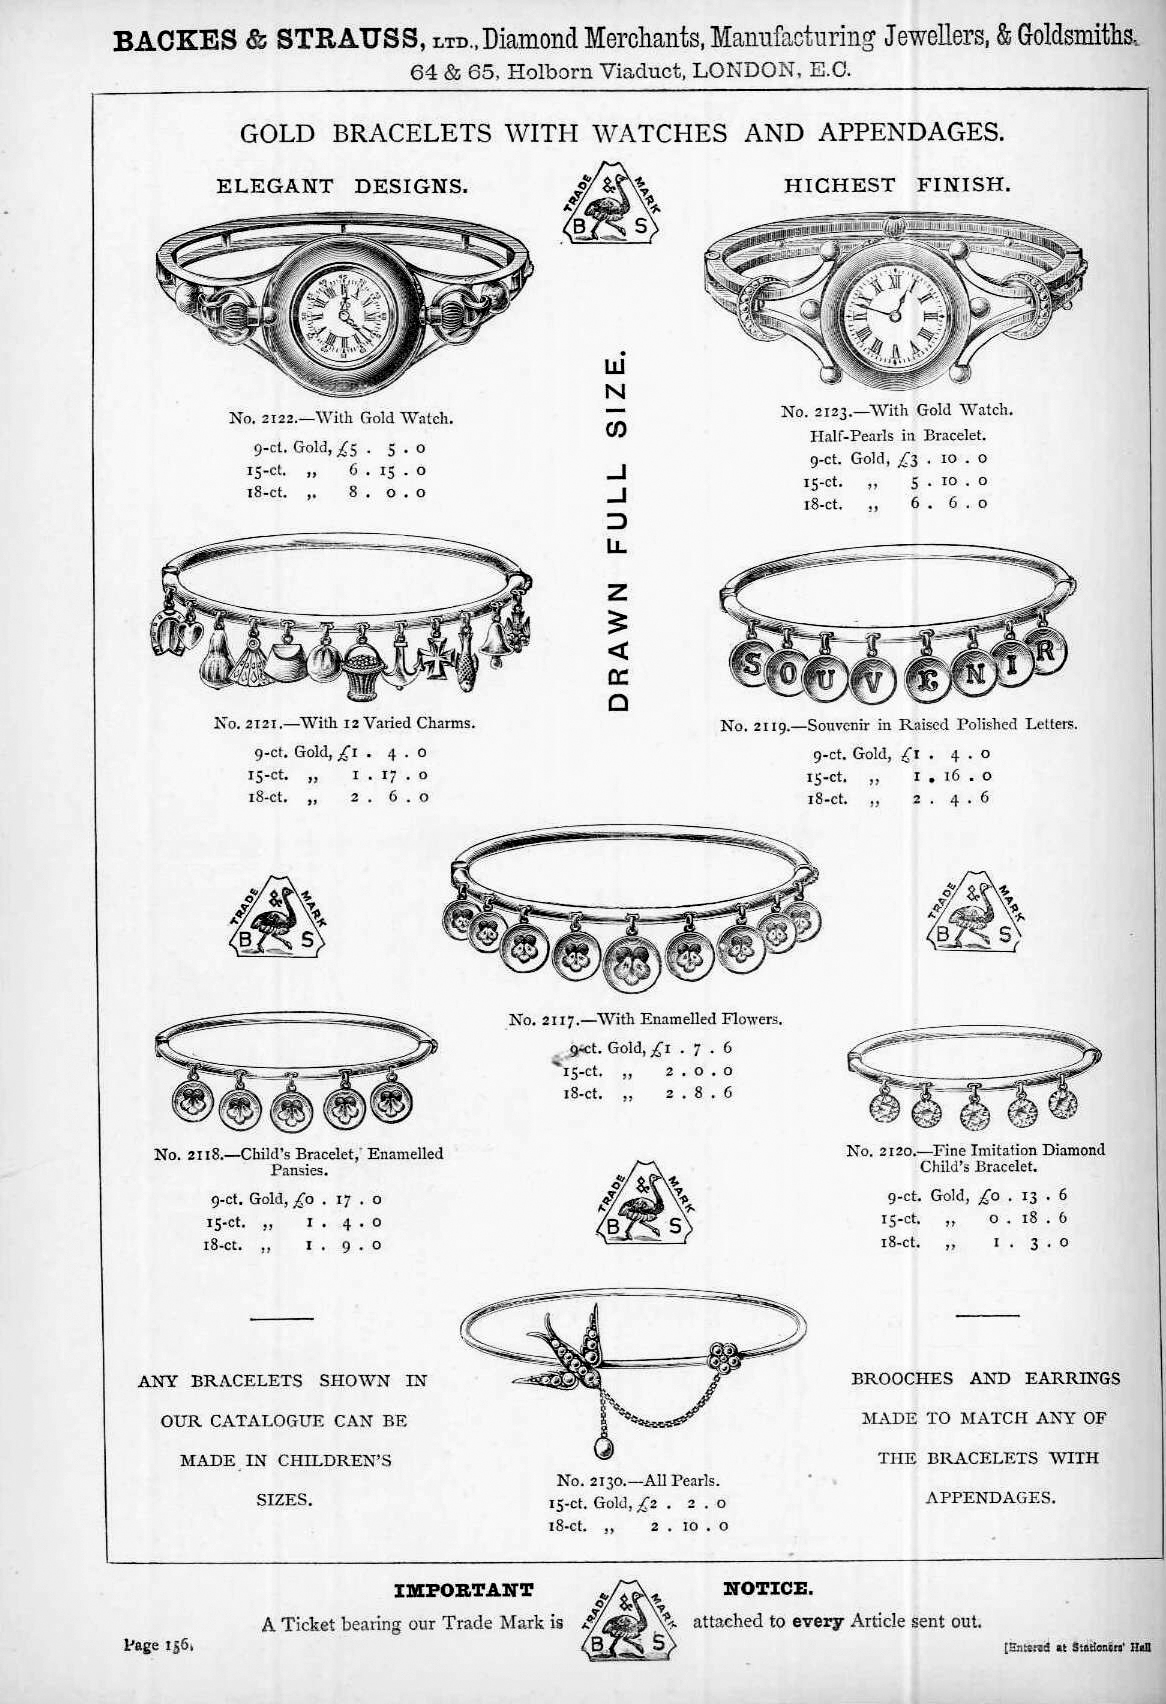 Backes & Strauss Jewellery Gold Watch Catalogue